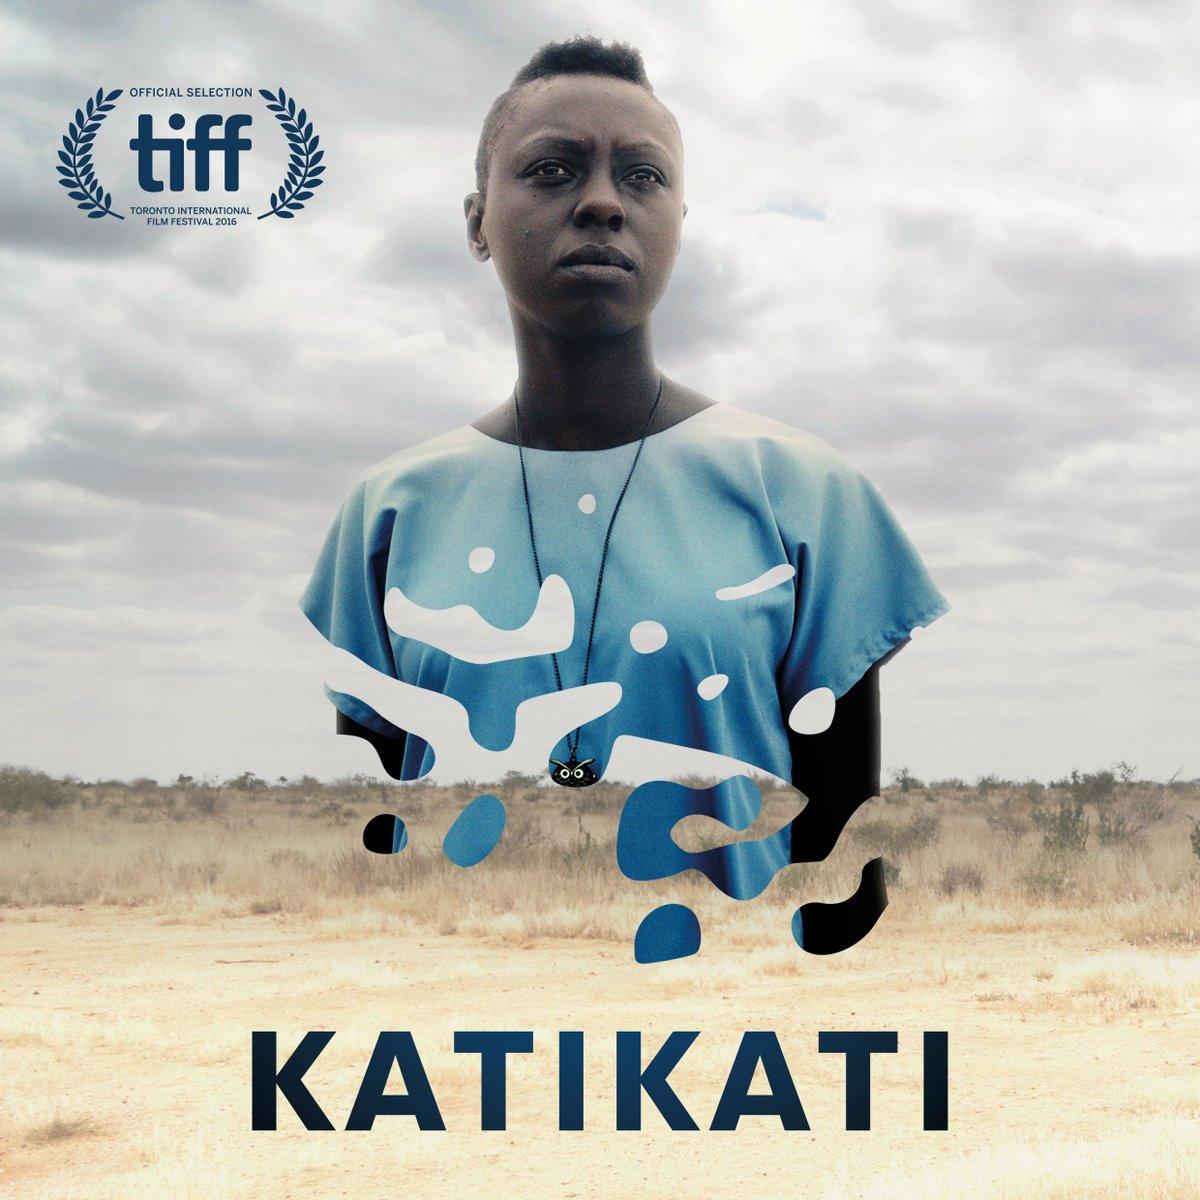 Honoured & so grateful that our little film, #KatiKati, will premiere at @TIFF_NET! Thank you @cameron_tiff! https://t.co/yYo8x4c1jj